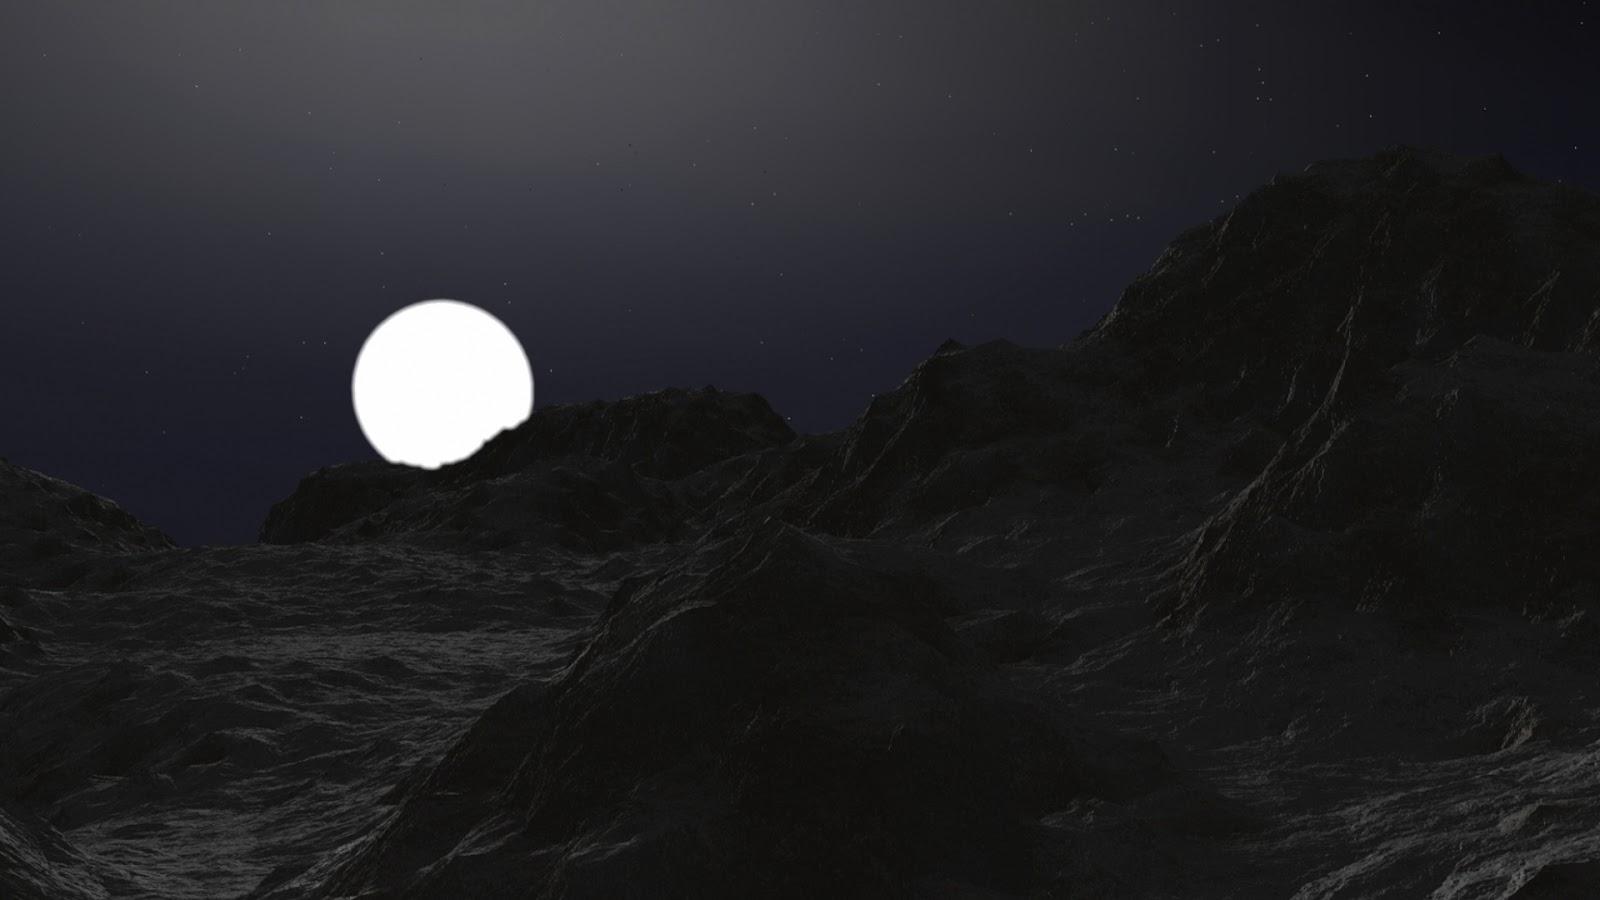 http://4.bp.blogspot.com/-H9jXnWmuV8U/UCY3eBZsLxI/AAAAAAAAMbc/8KtB7rTw2Pc/s1600/Moon+wallpapers+1.jpg